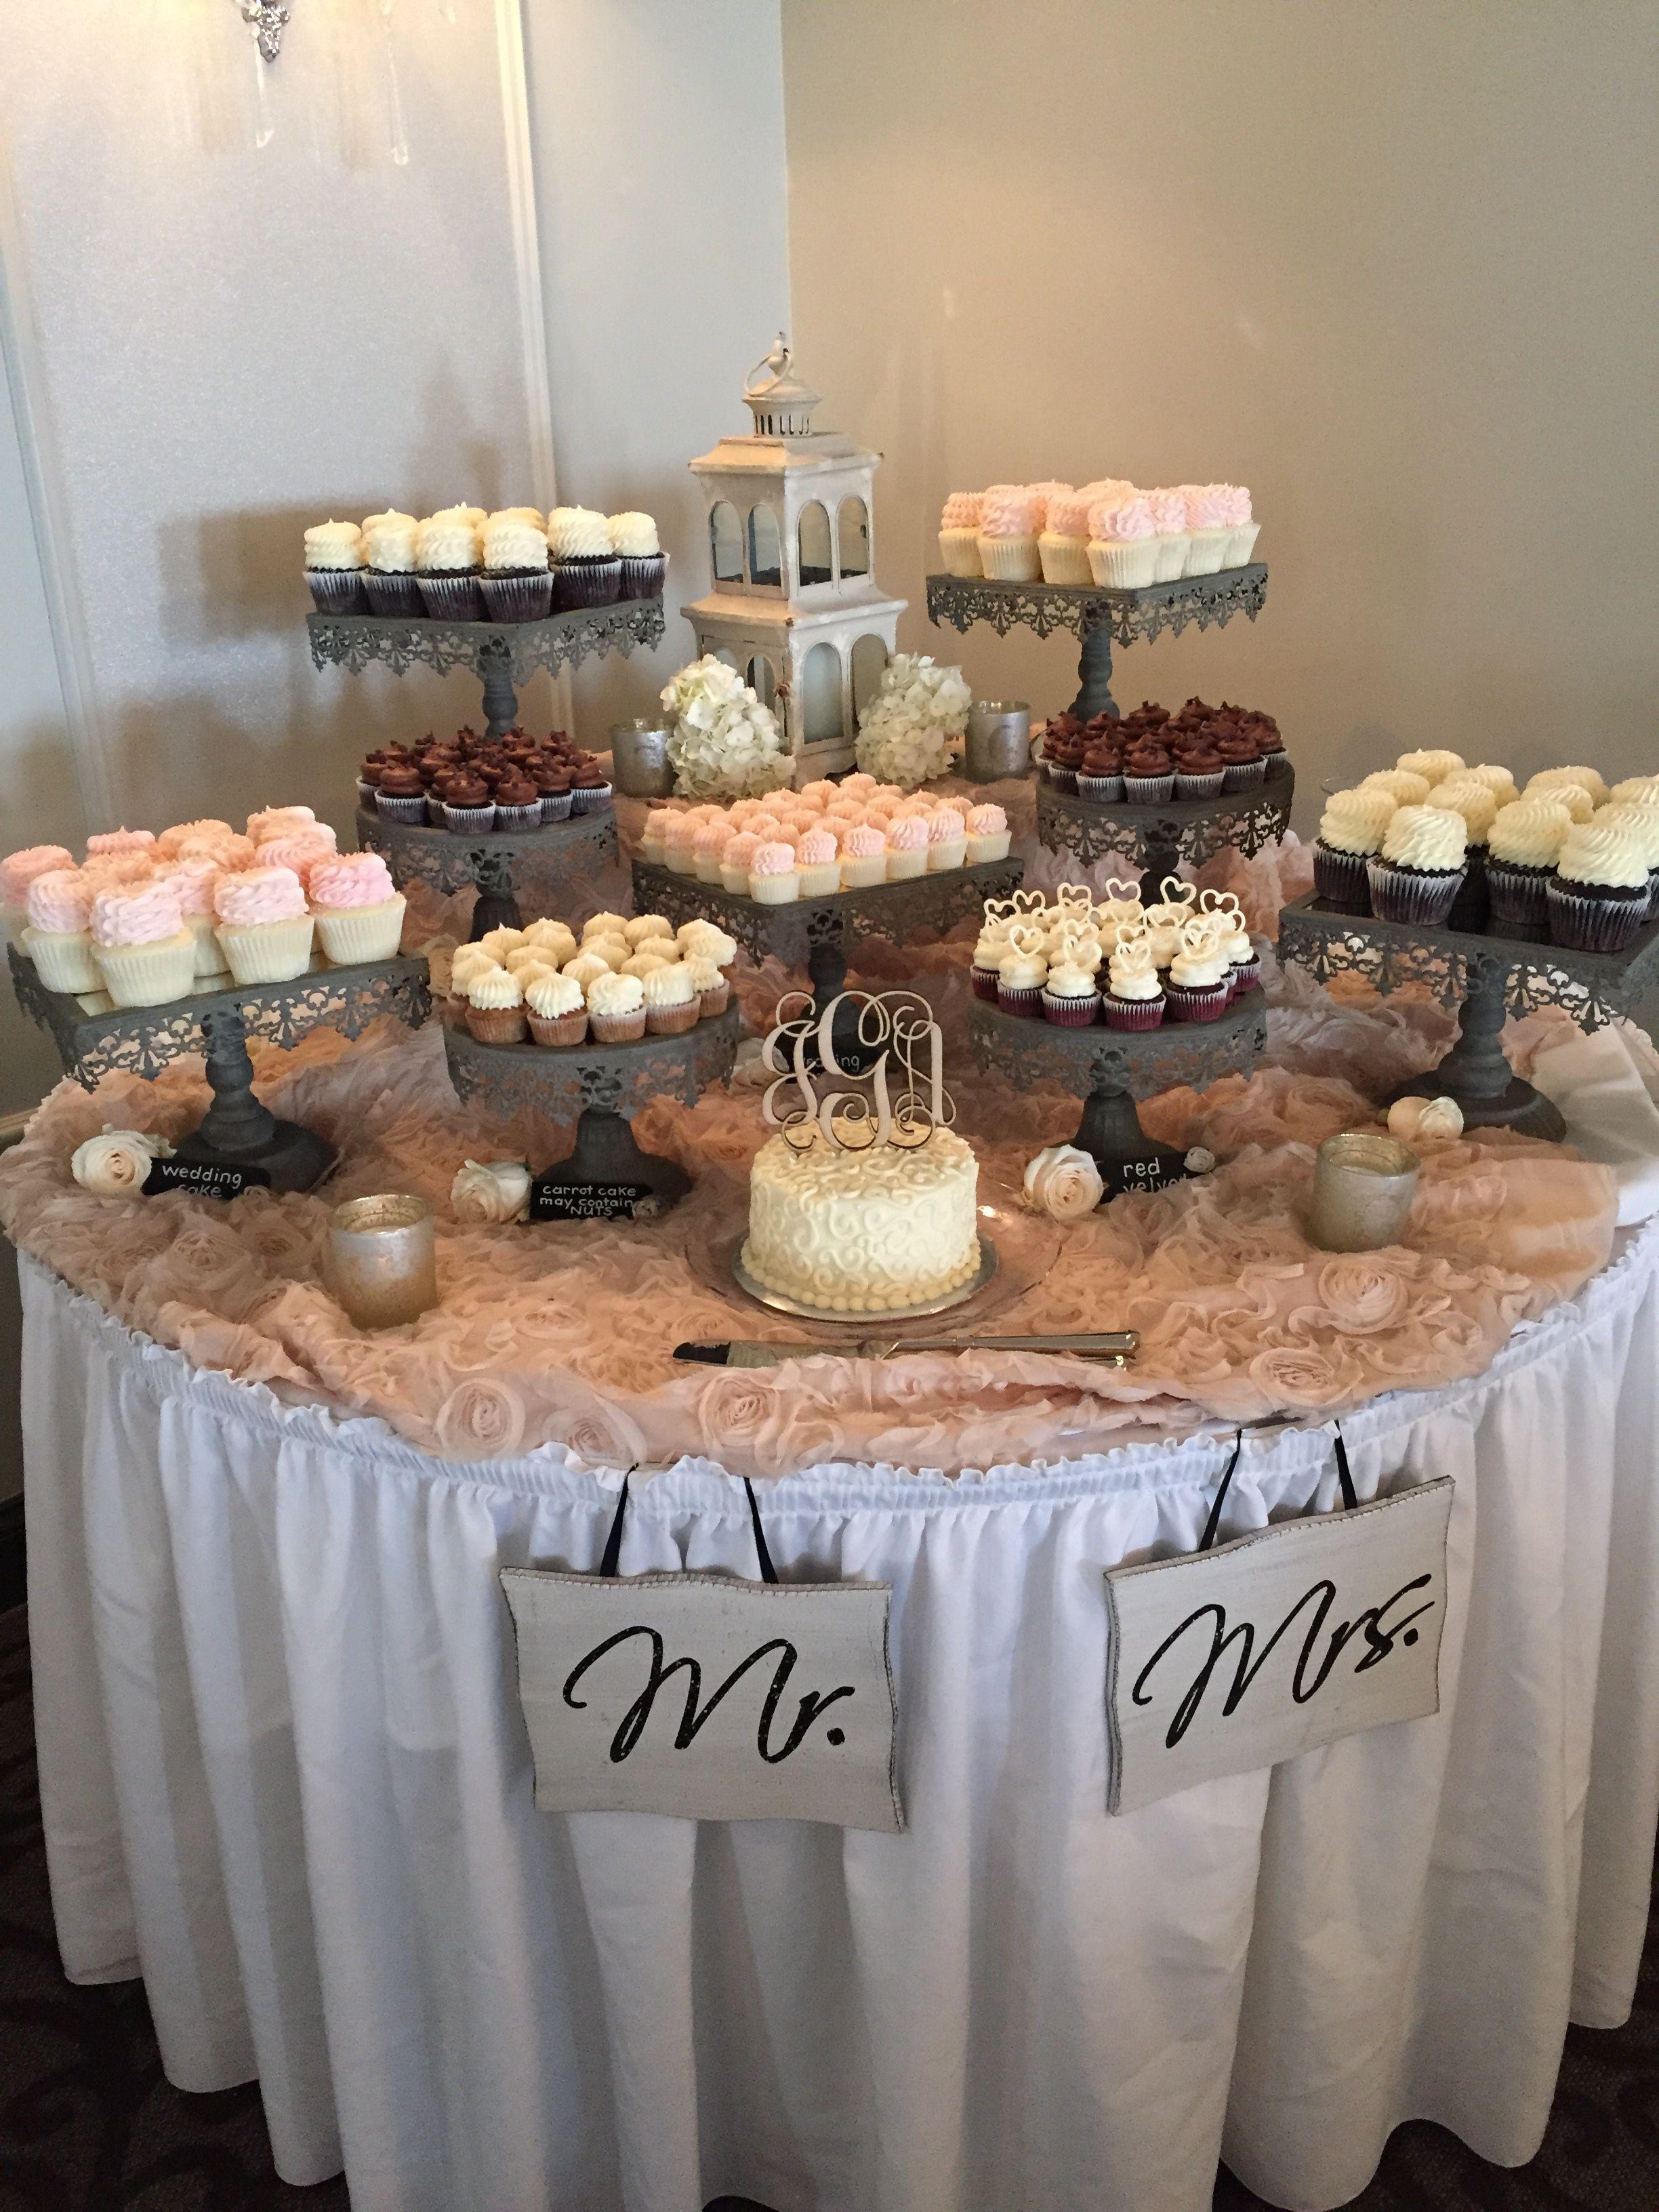 Dessert Table Goals 3 Themadisoneventcenter Weddingcake Cake Wedding Cakegoa Dessert Bar Wedding Dessert Display Wedding Rehearsal Dinner Dessert Ideas